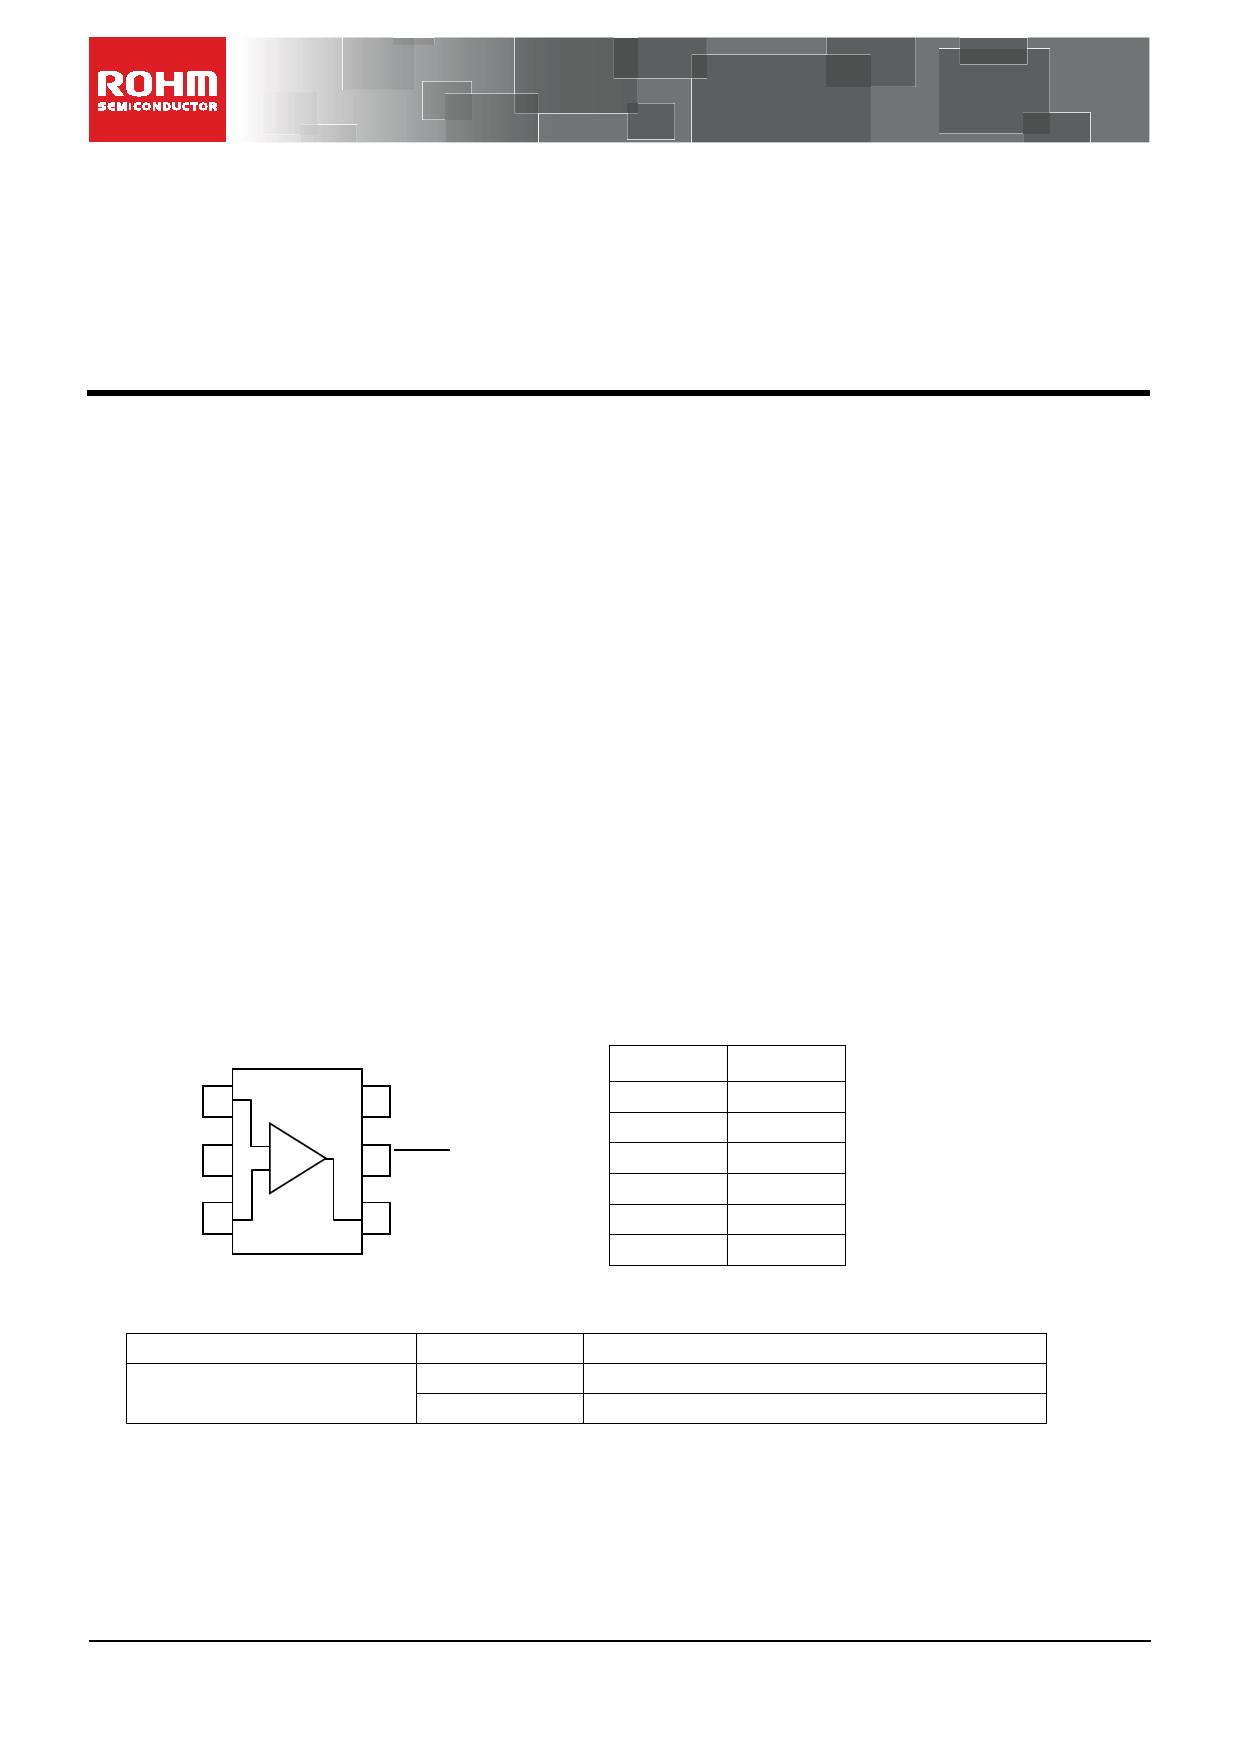 TLR344F datasheet